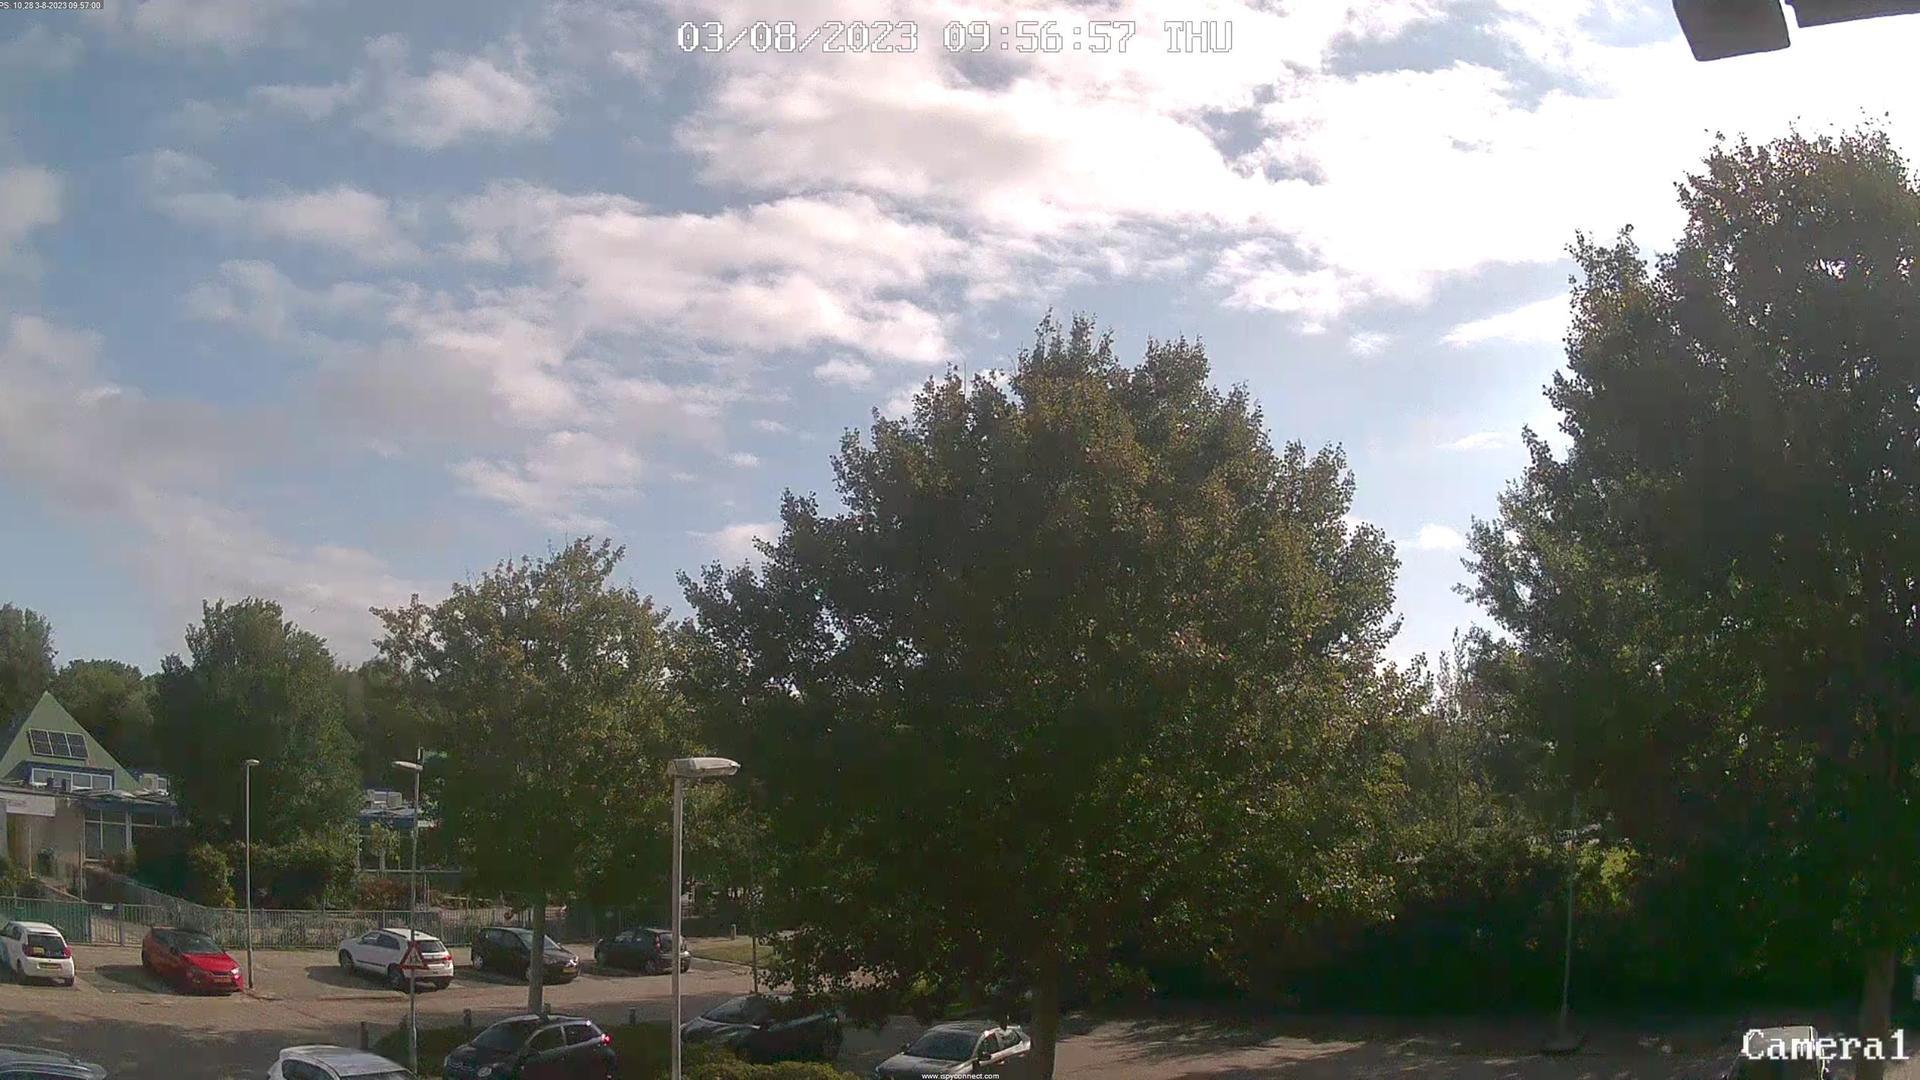 Webkamera Julianadorp › South-East: Meteo